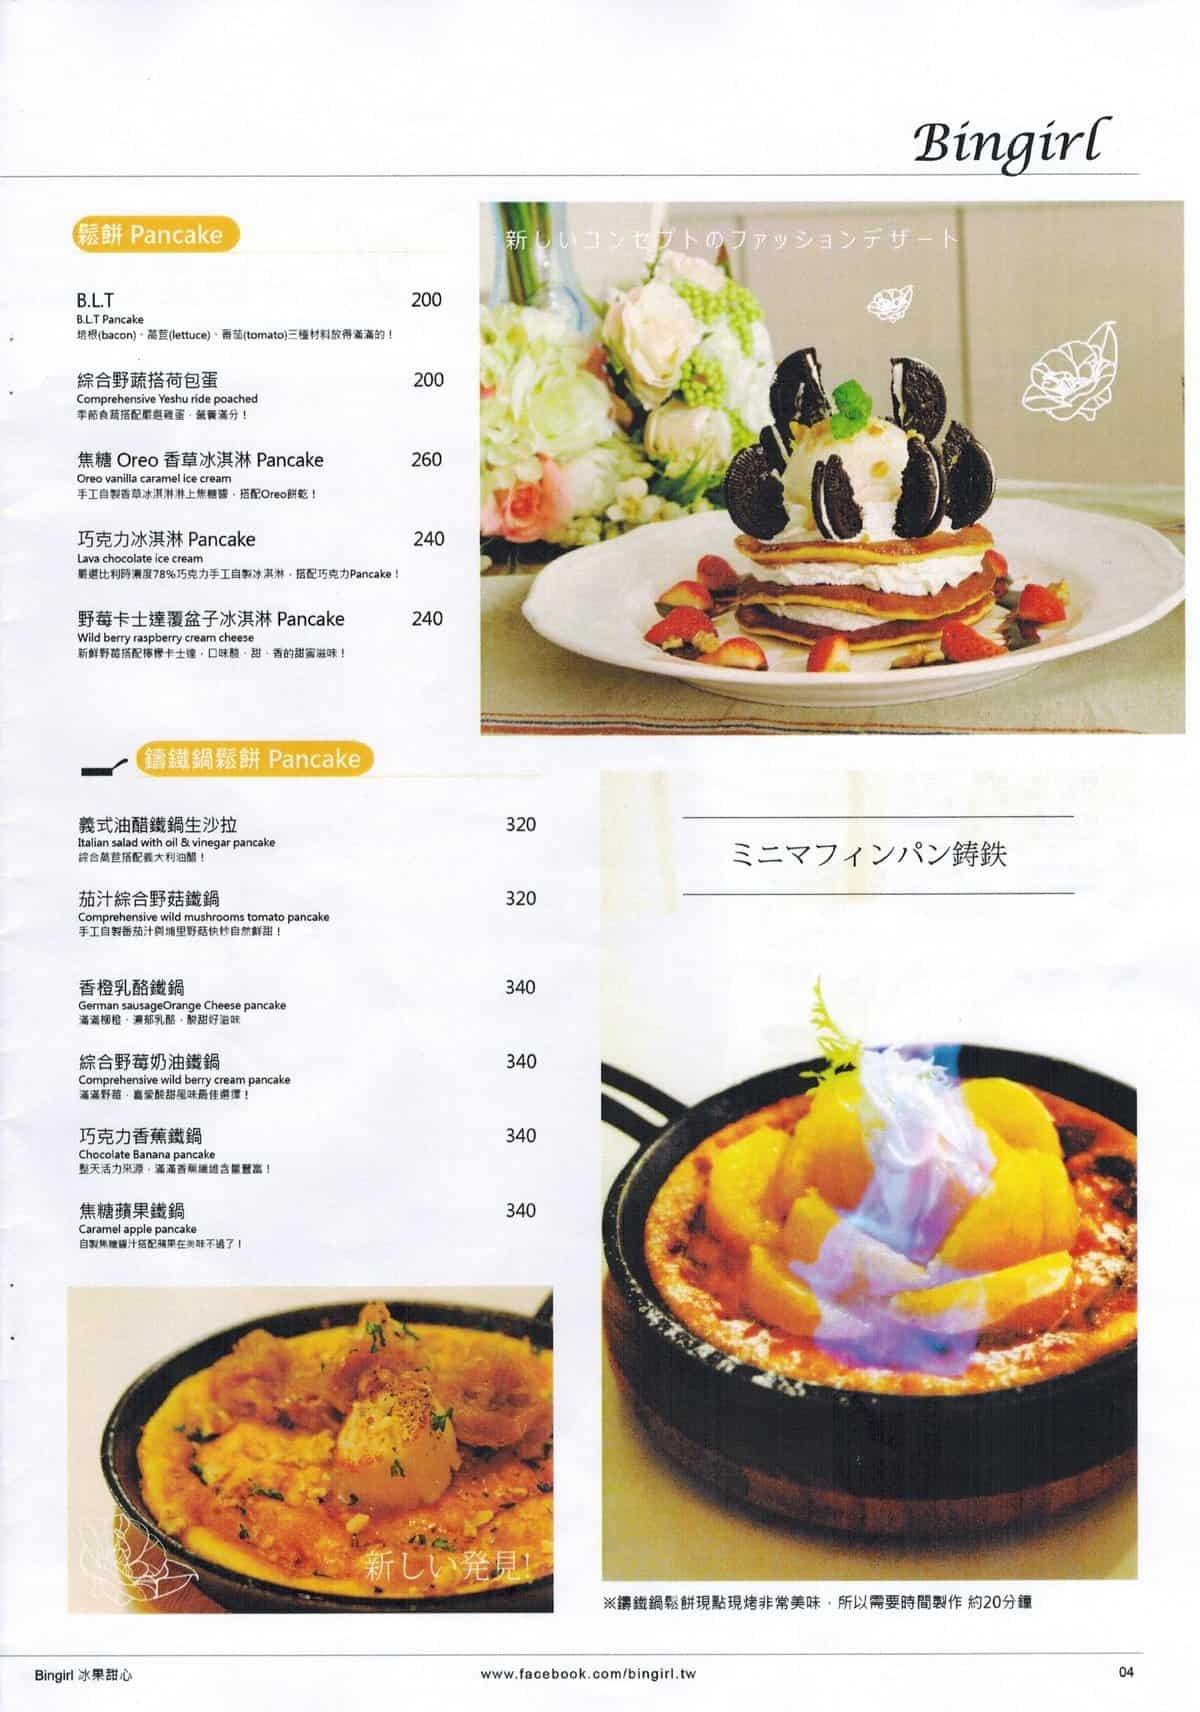 taipei-bingirl-menu5